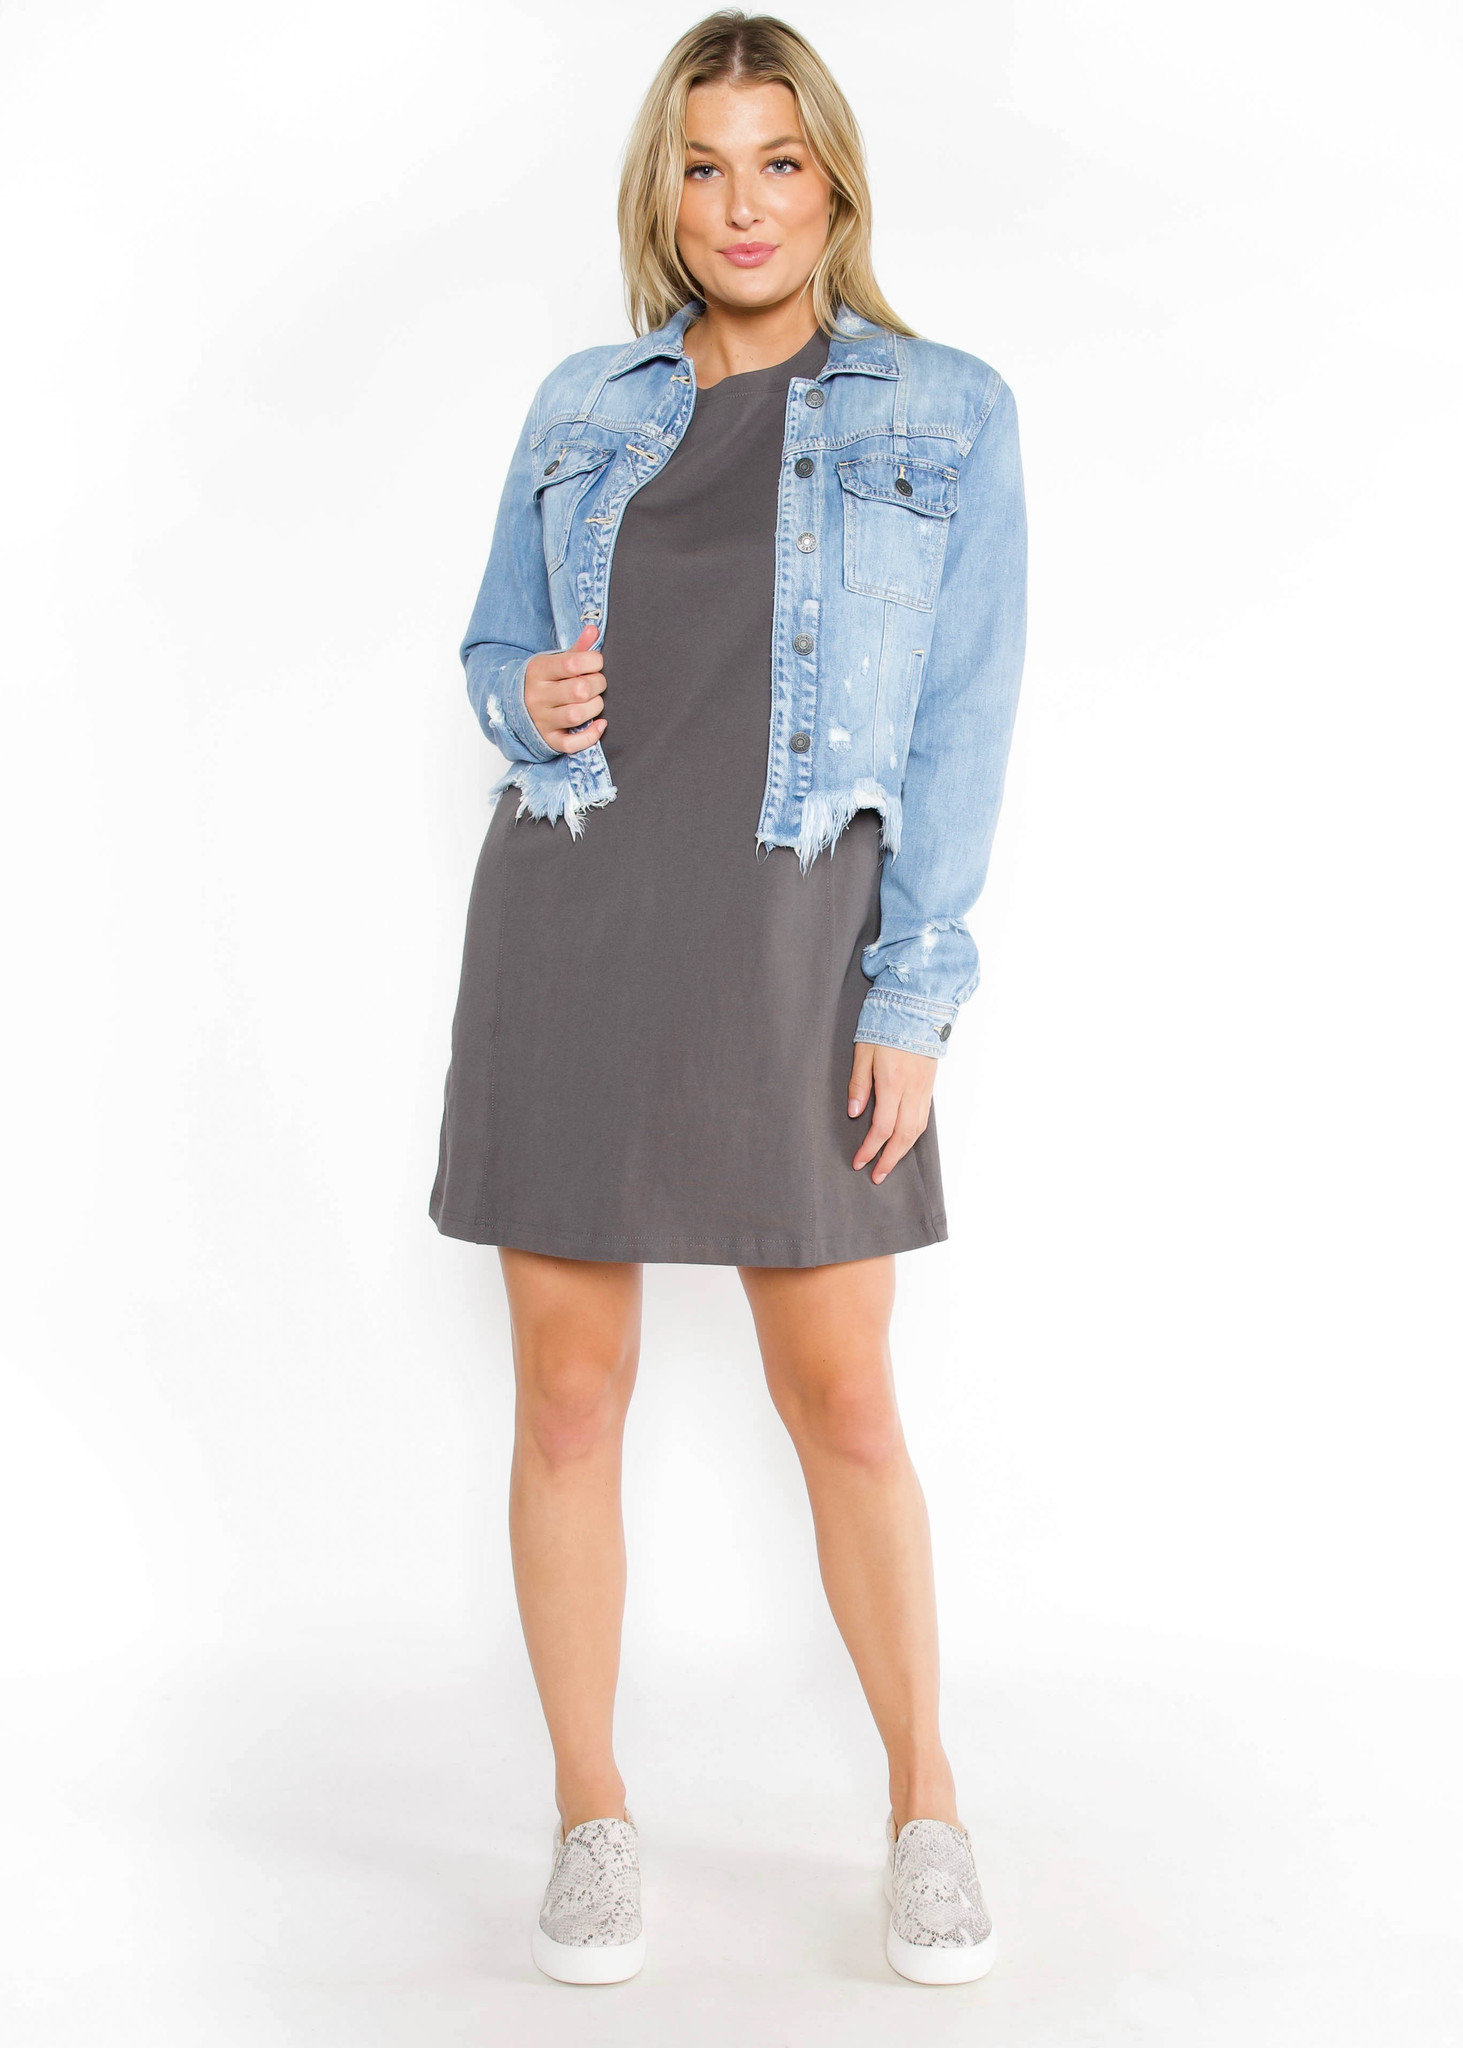 DAYBREAK T-SHIRT DRESS - GREY